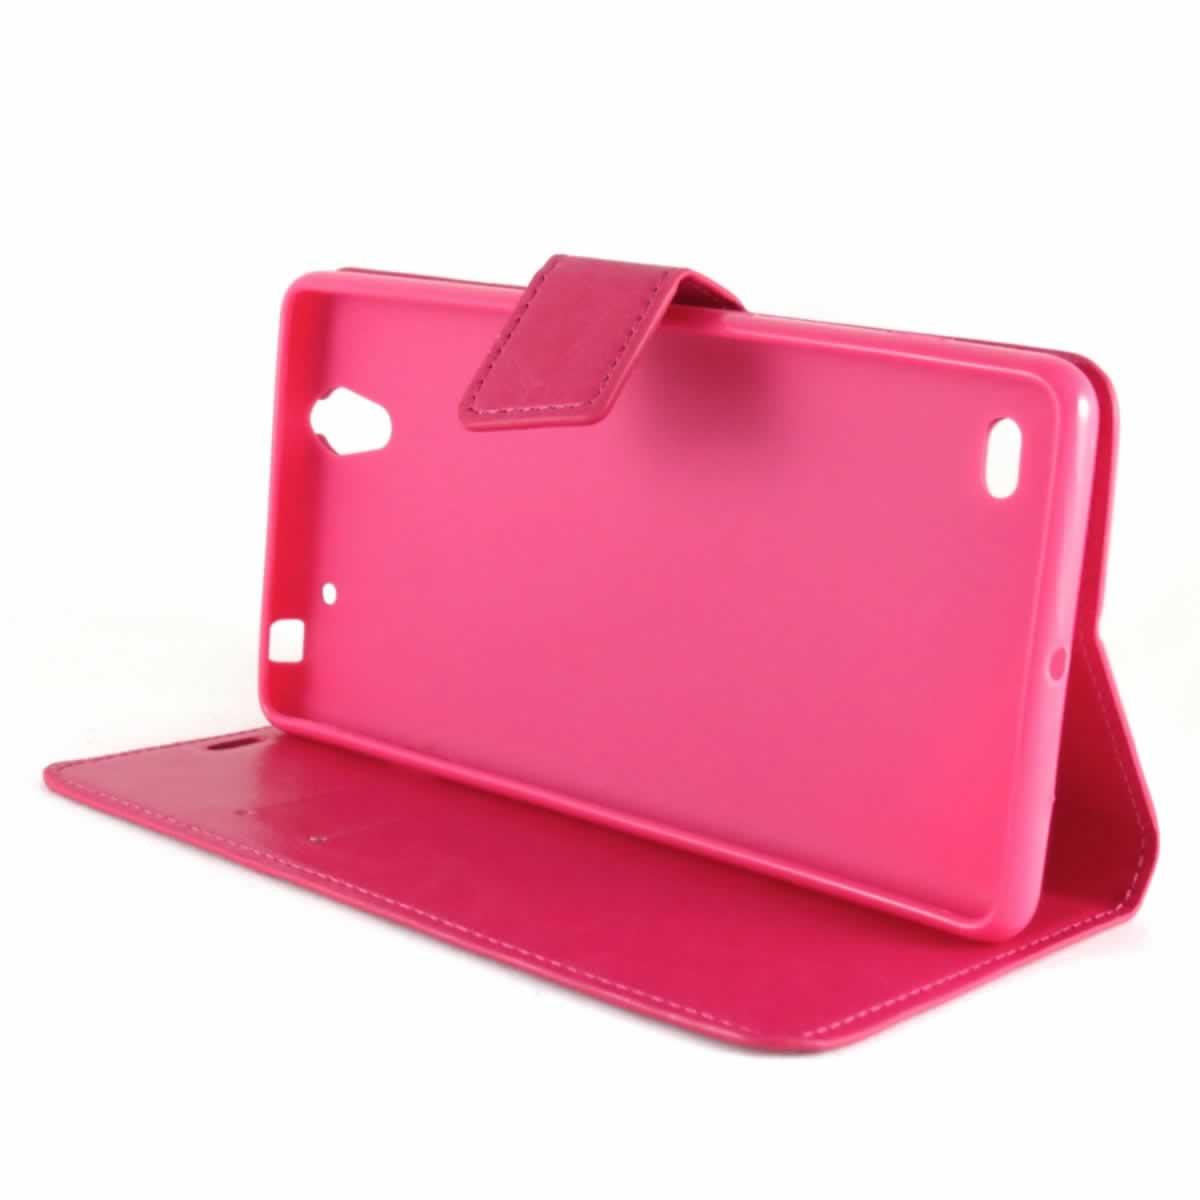 Capa Sony Xperia C4 Dual - Carteira Flip - Rosa